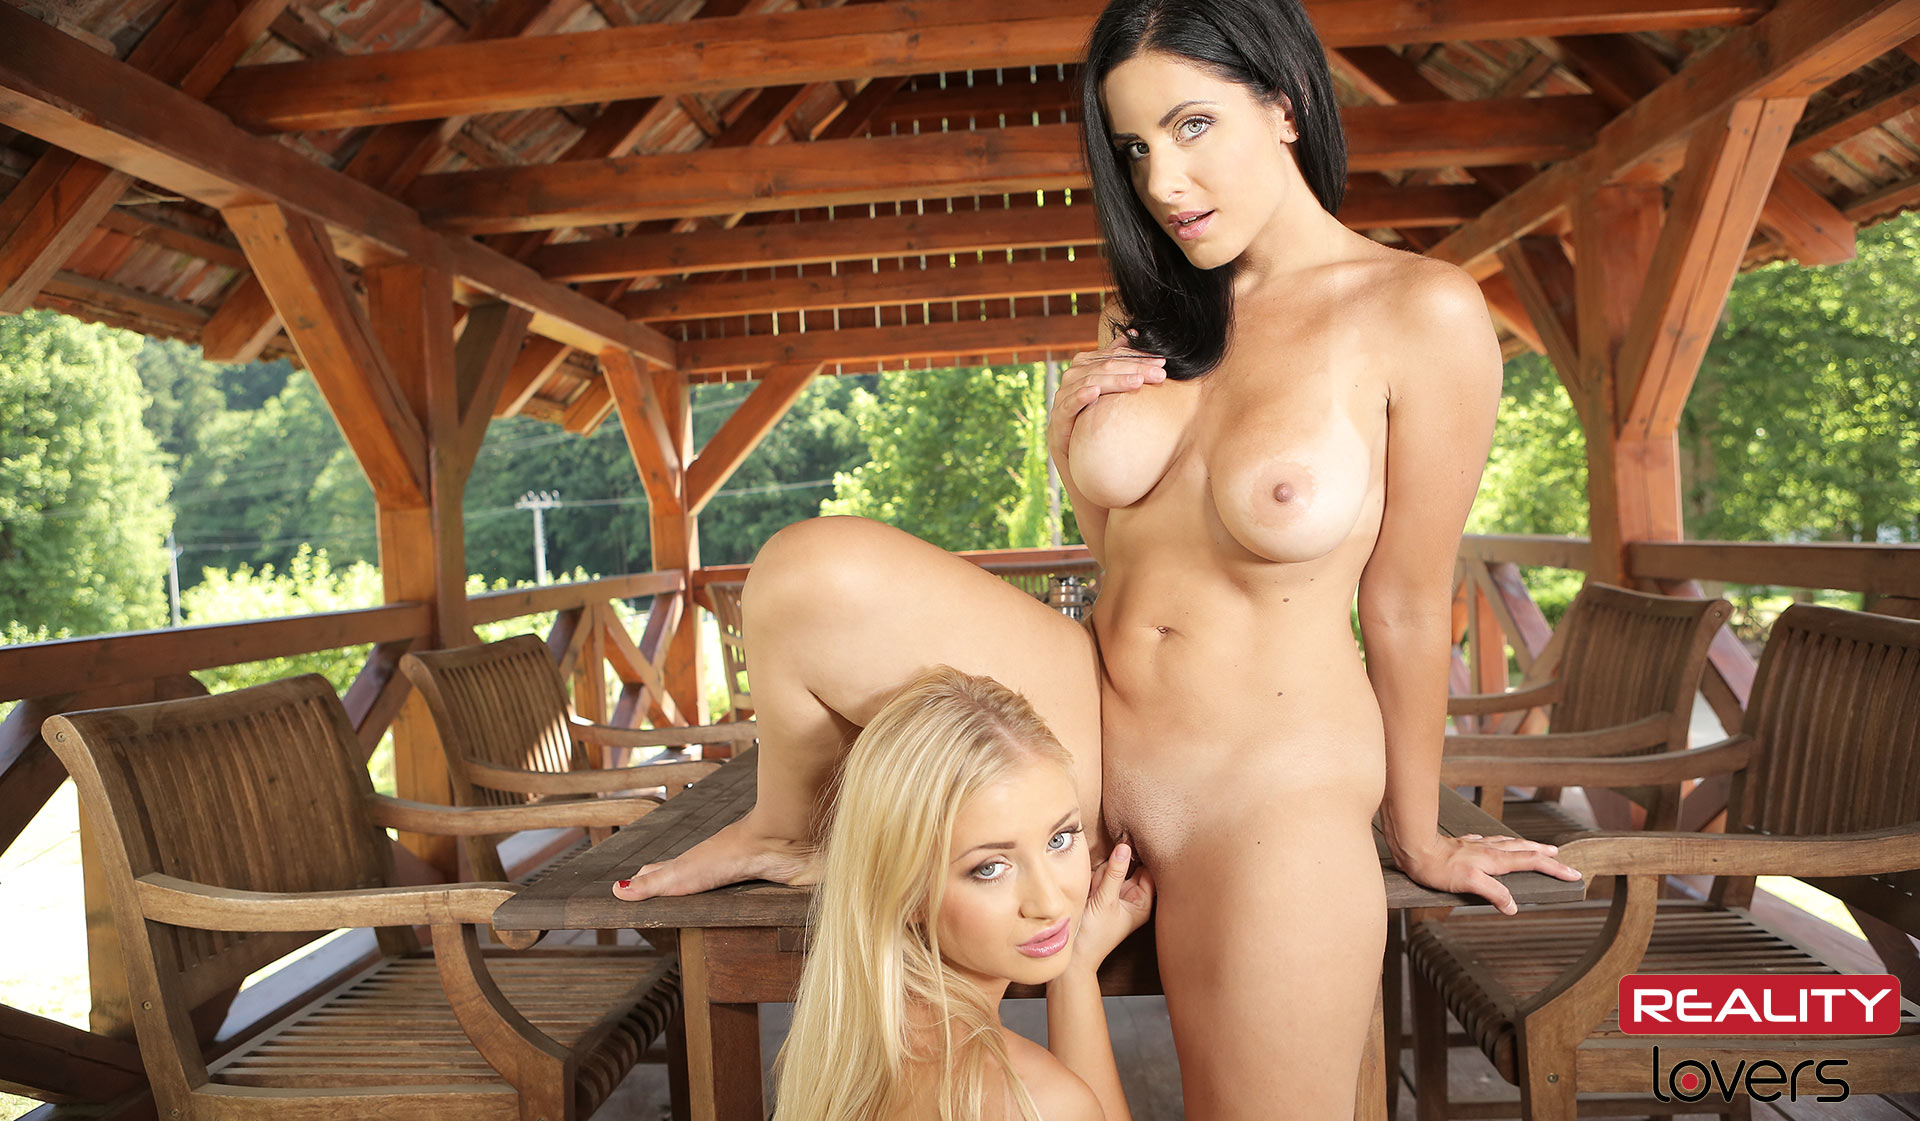 Lesbian Summerhouse VR Porn